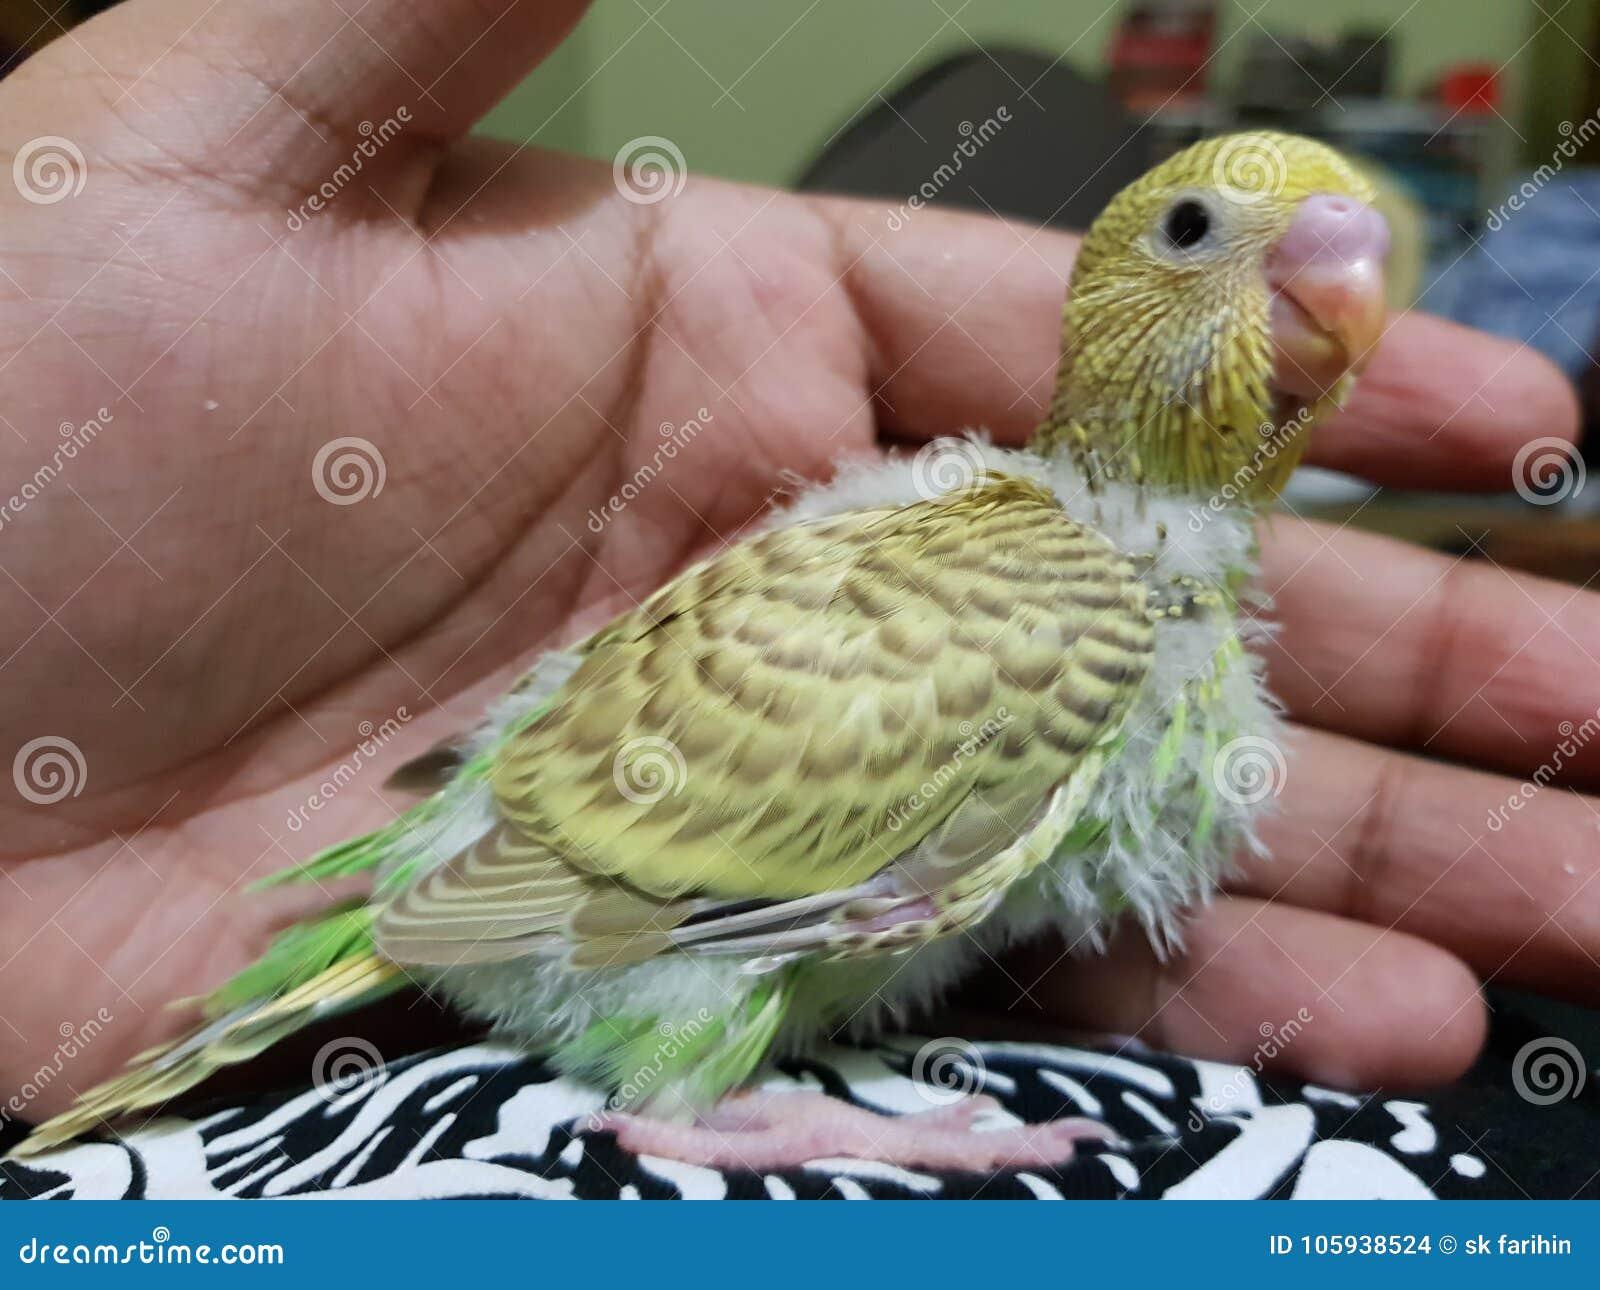 Babies of budgies stock photo  Image of beak, perico - 105938524